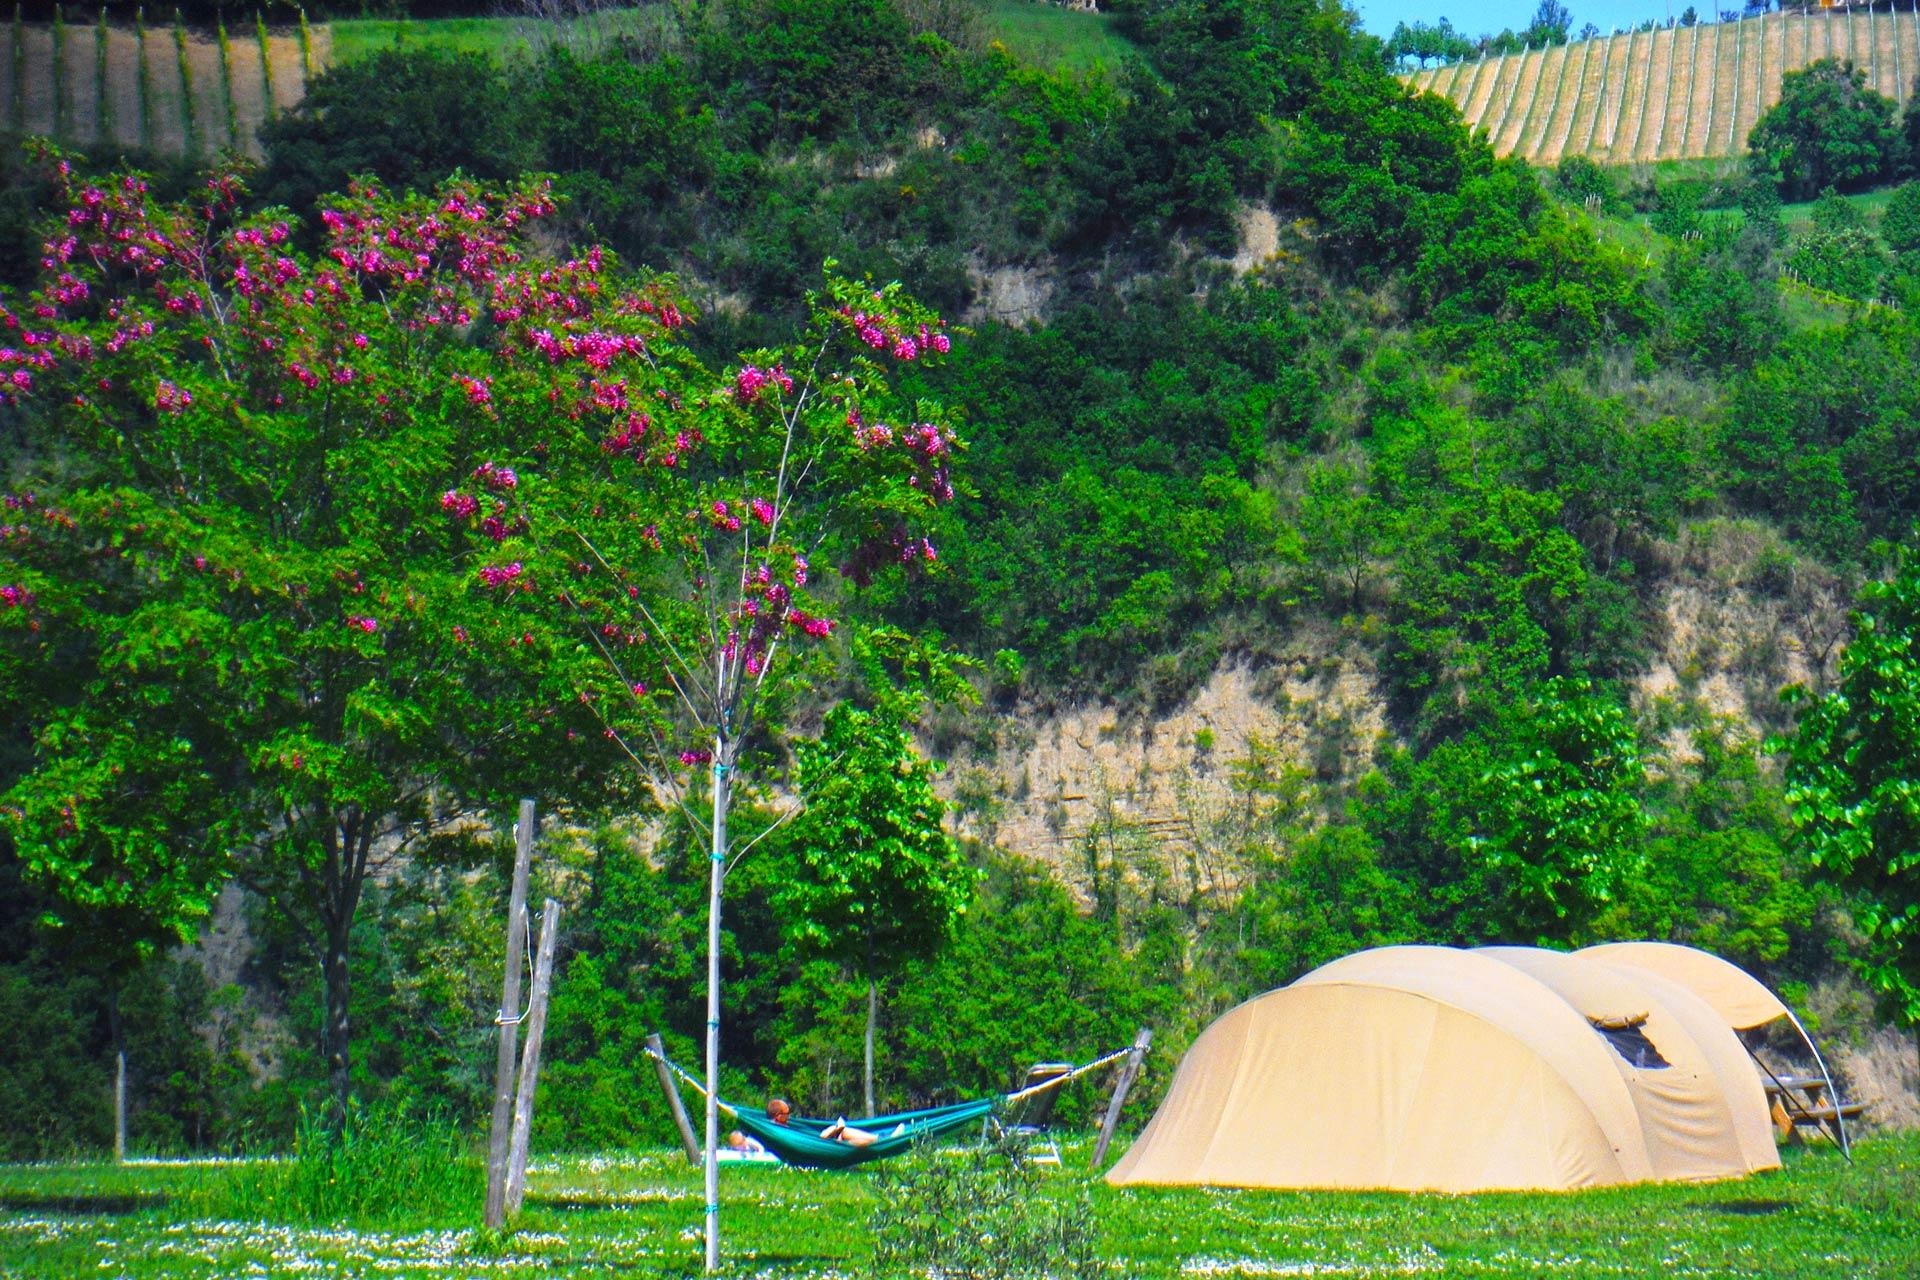 Huurtent-B&B-Agricamp-Picobello-Shell-inkijk-minicamping-bed&breakfast-trekking